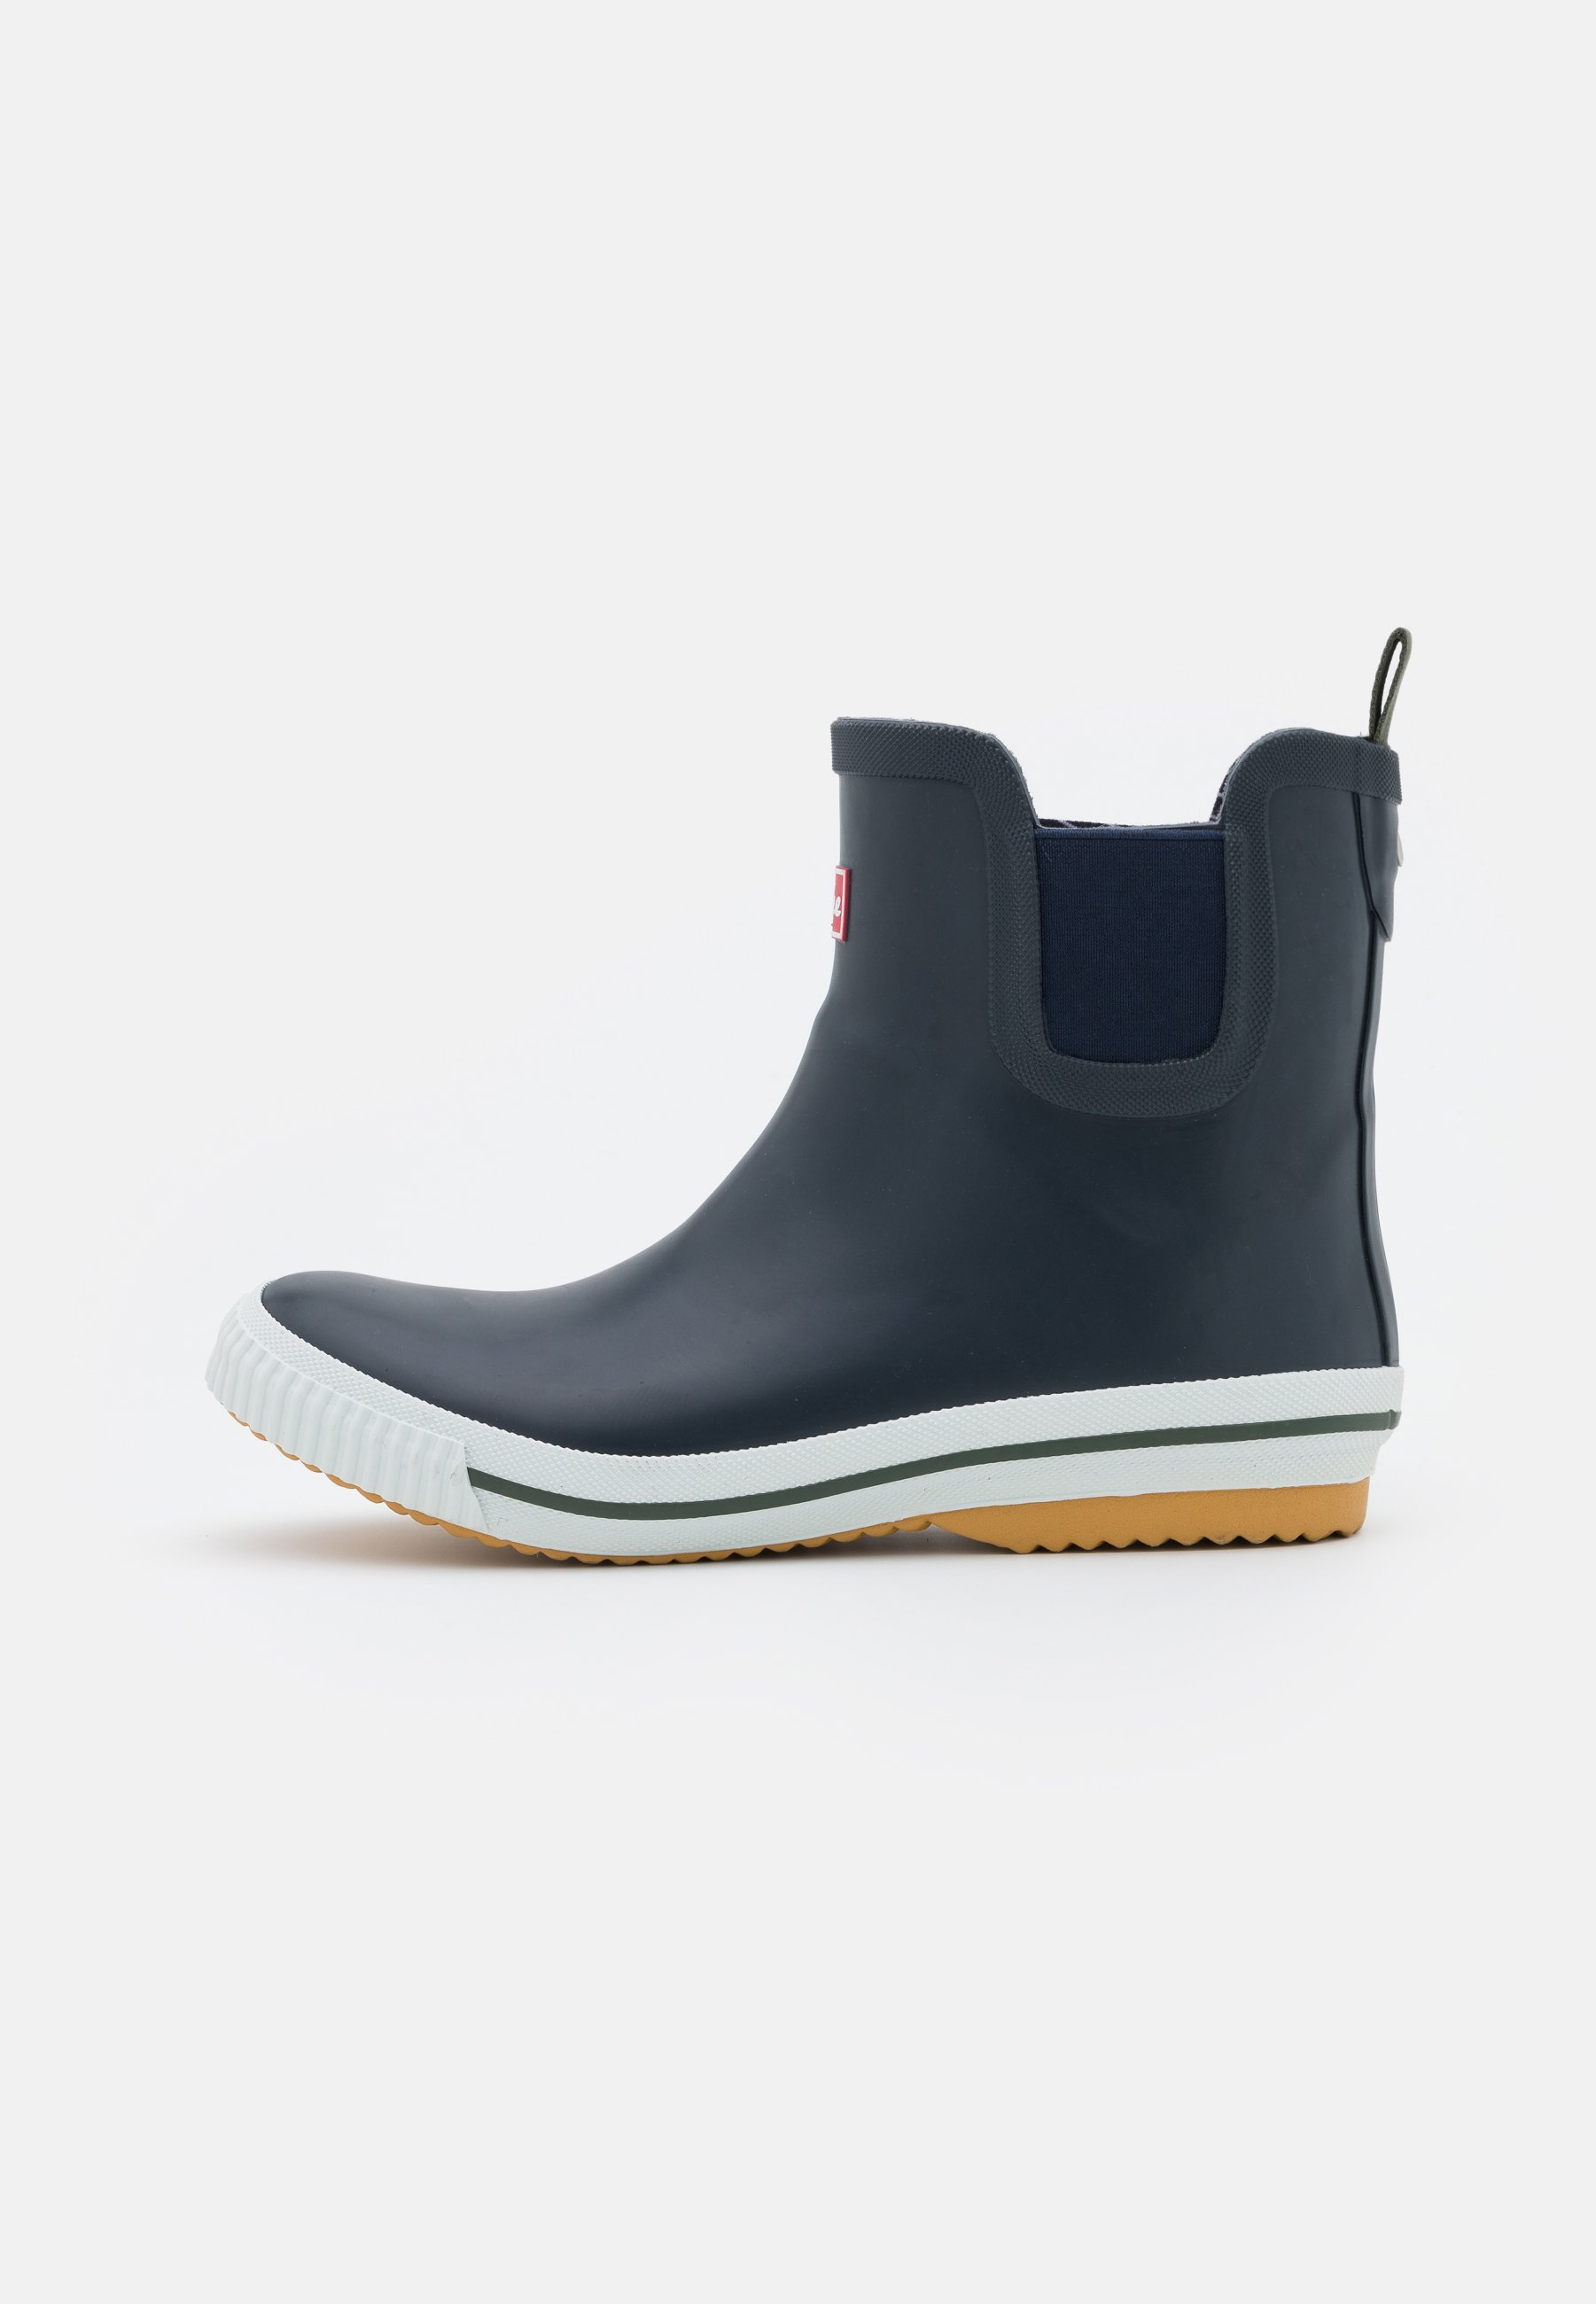 Damen Plateau Stiefeletten Worker Boots Leicht Gefütterte Stiefel 897152 Mode